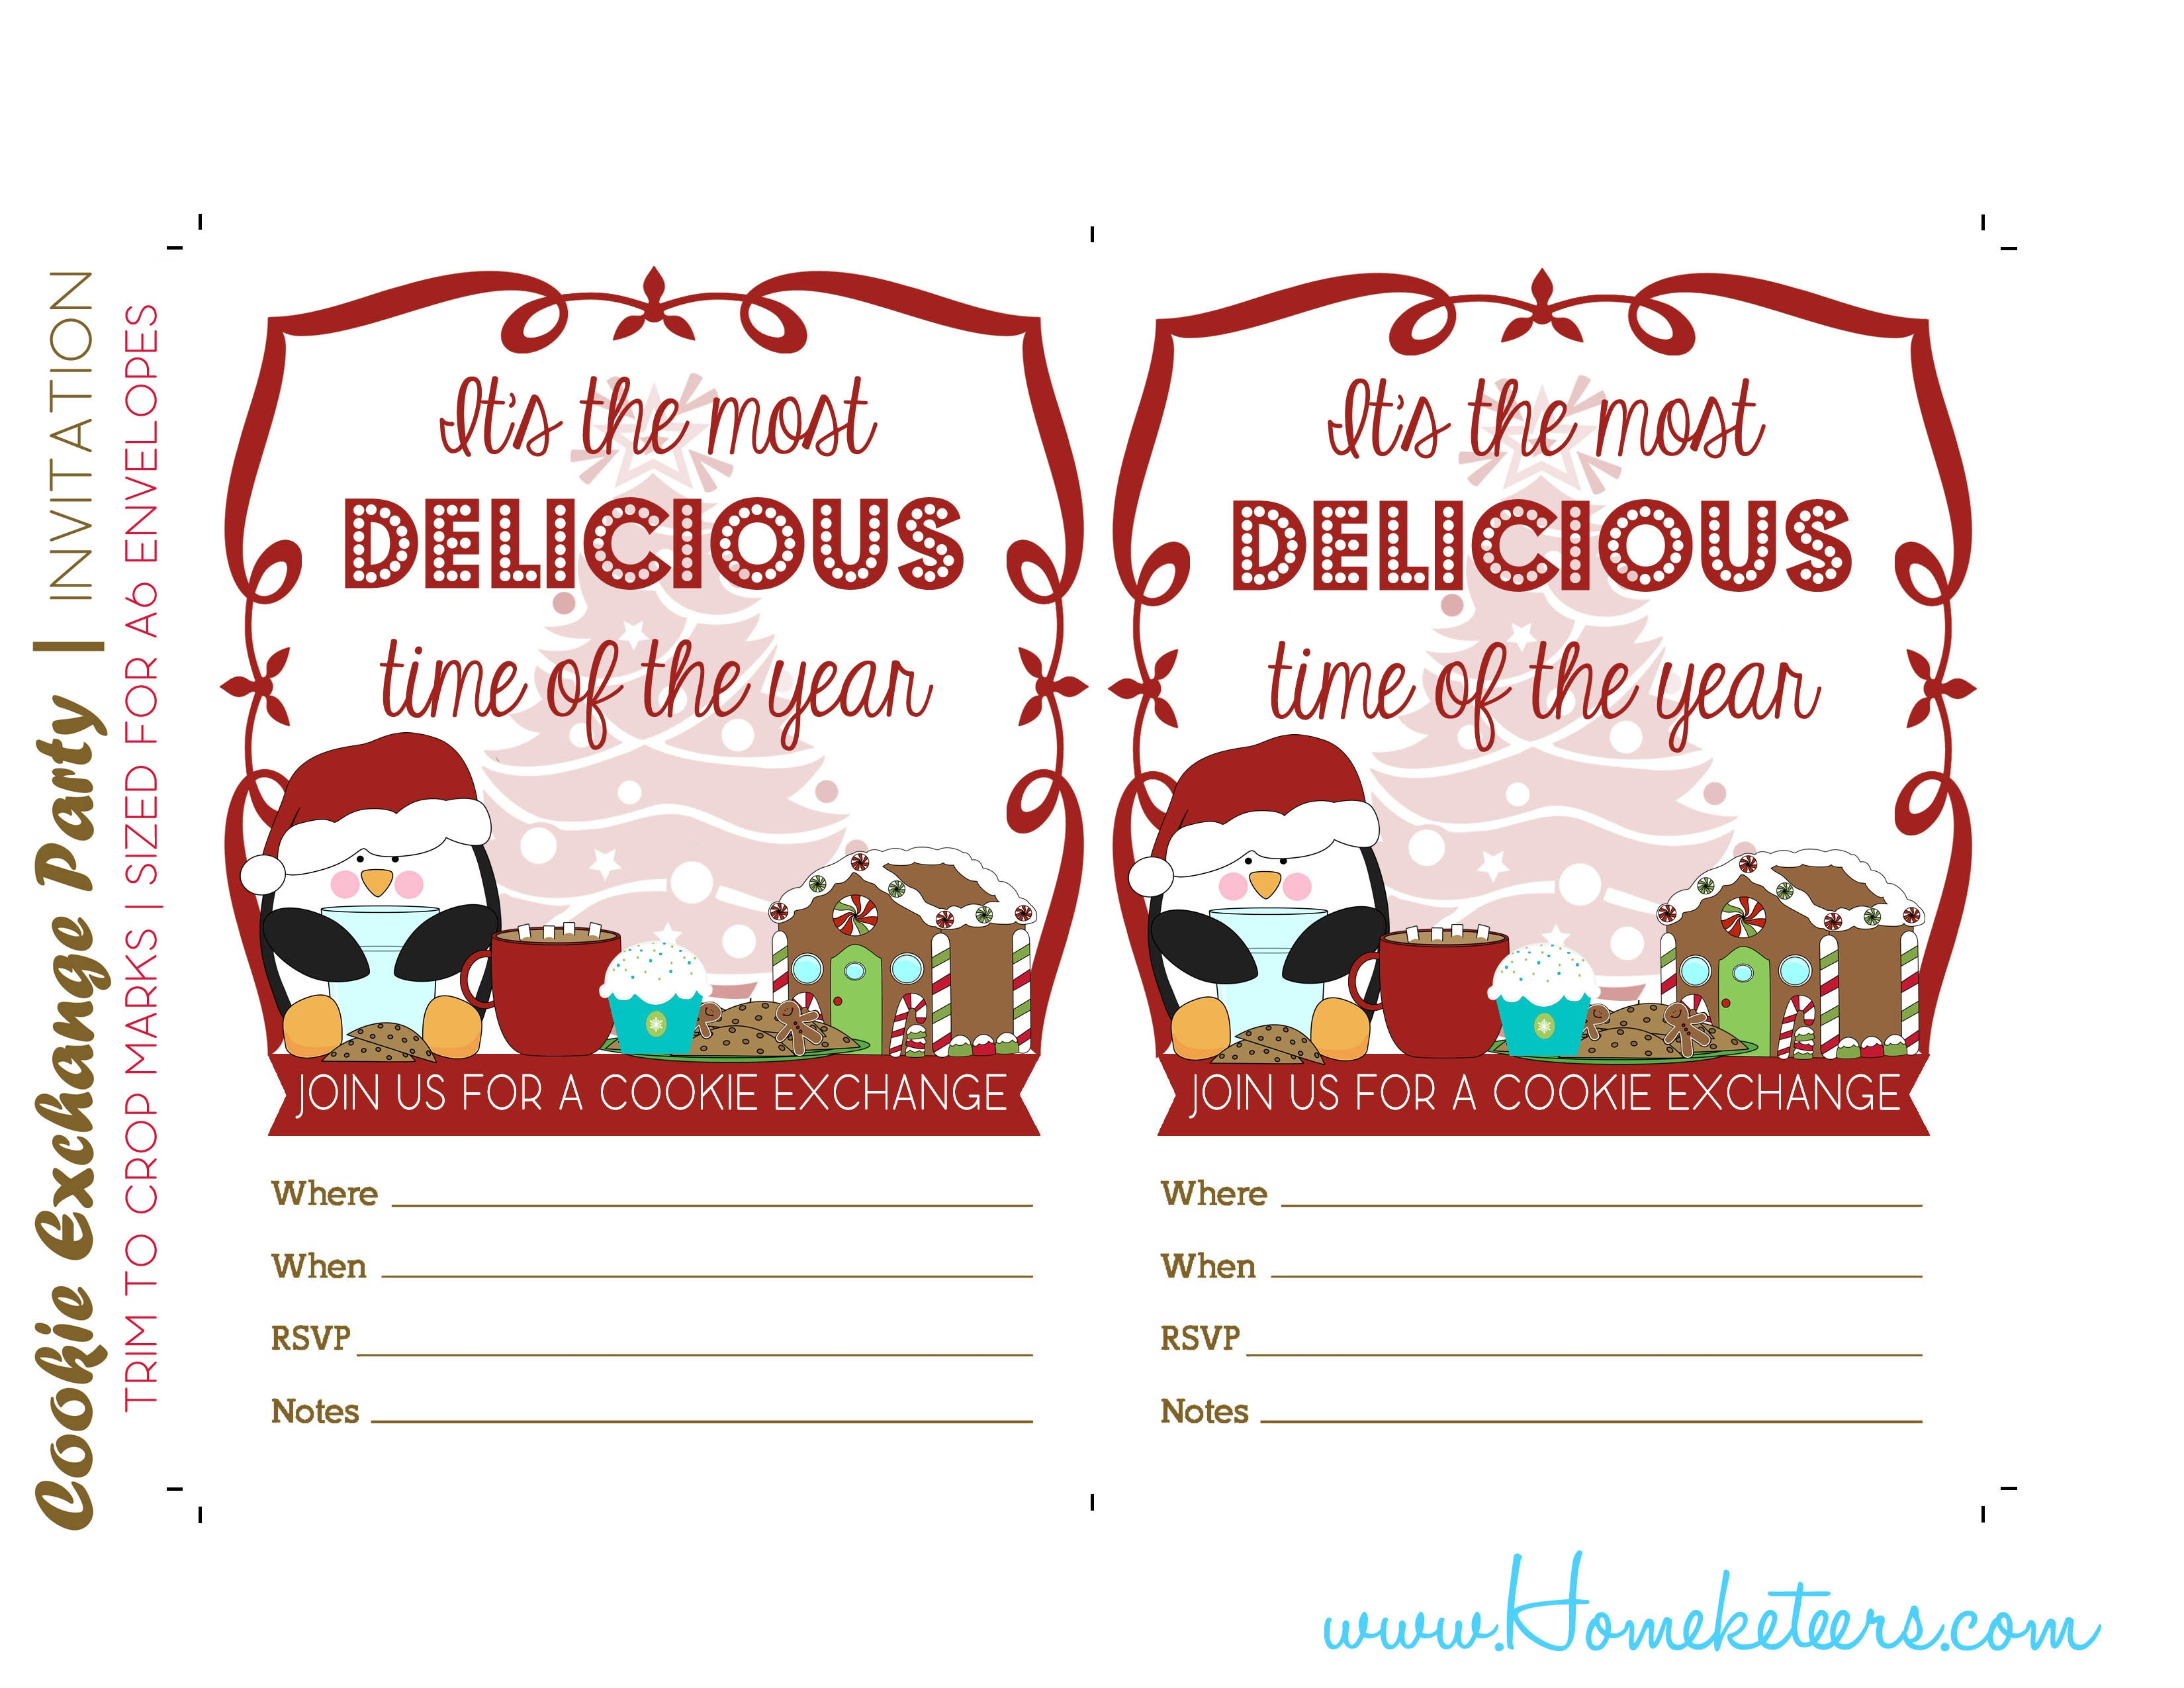 Free Christmas Cookie Exchange Printable Invitation – Festival - Free Christmas Cookie Exchange Printable Invitation